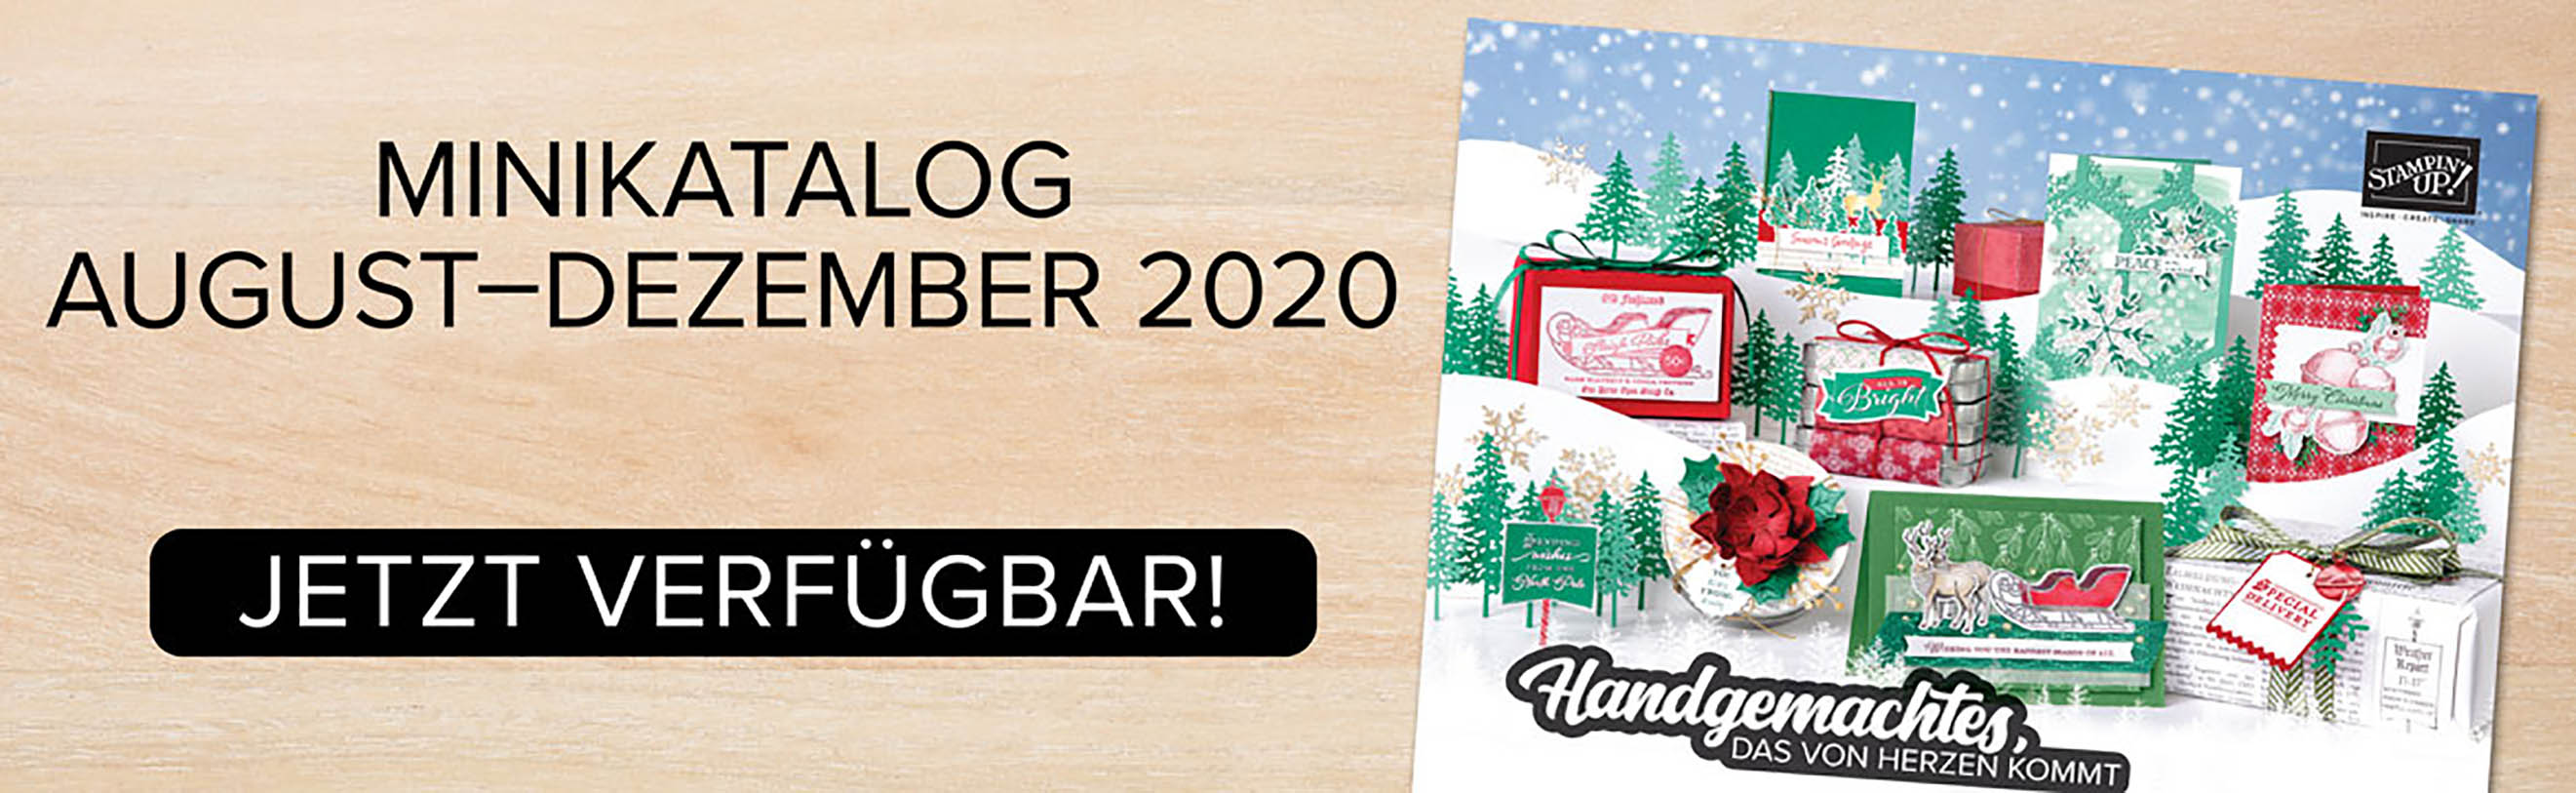 Minikatalog August – Dezember 2020